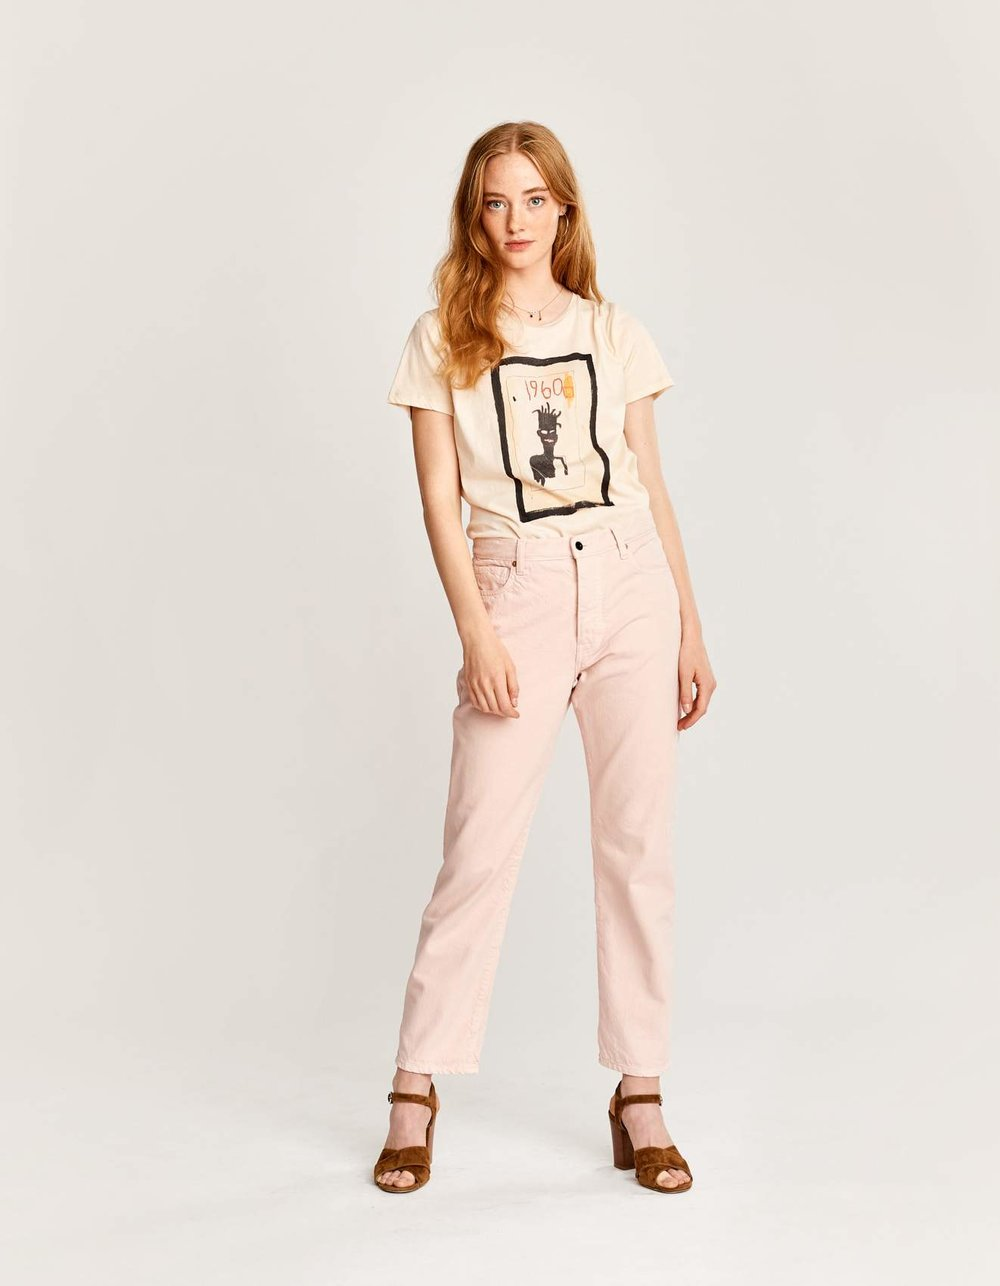 Bellerose-t-shirt-covi91-t1234m-milkyway_8_5000x5000.jpg